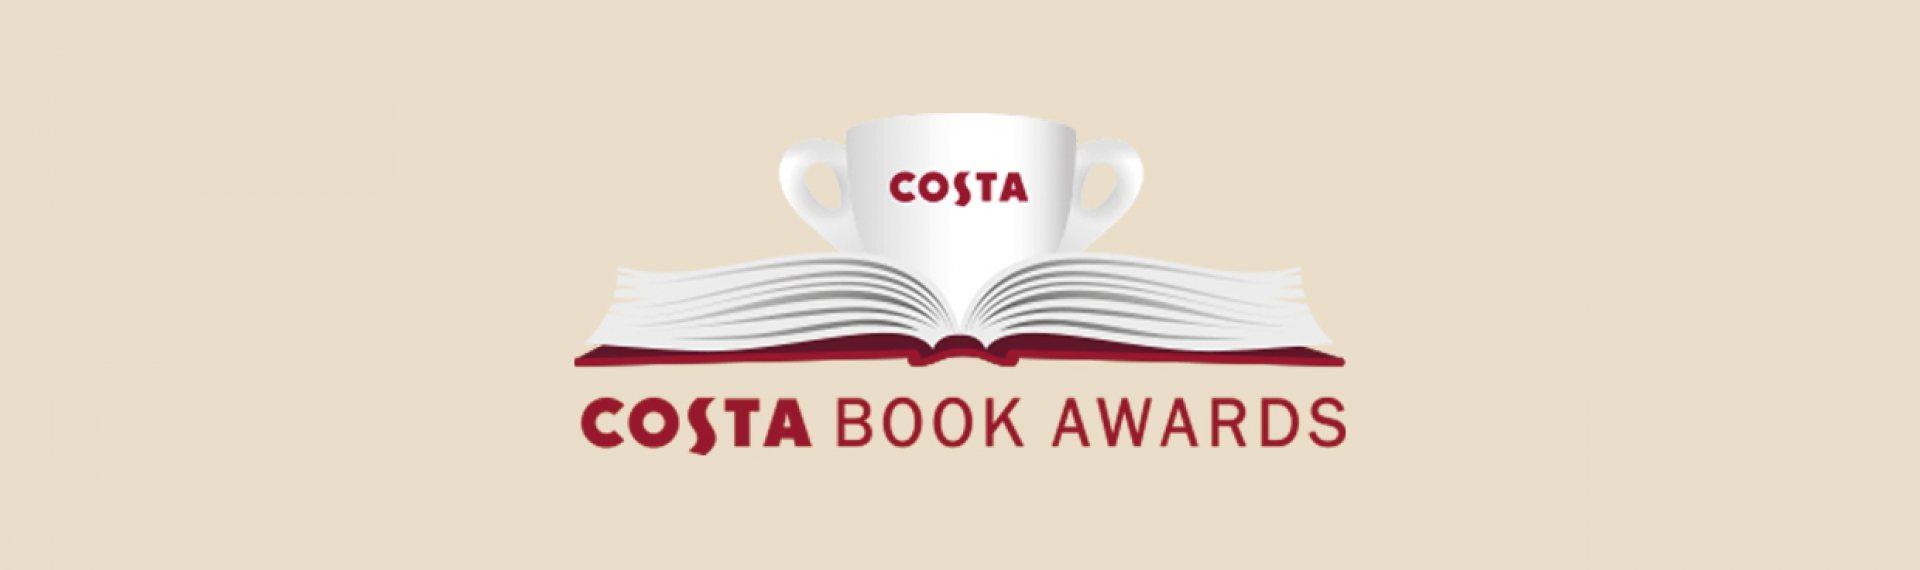 Costa Book Awards